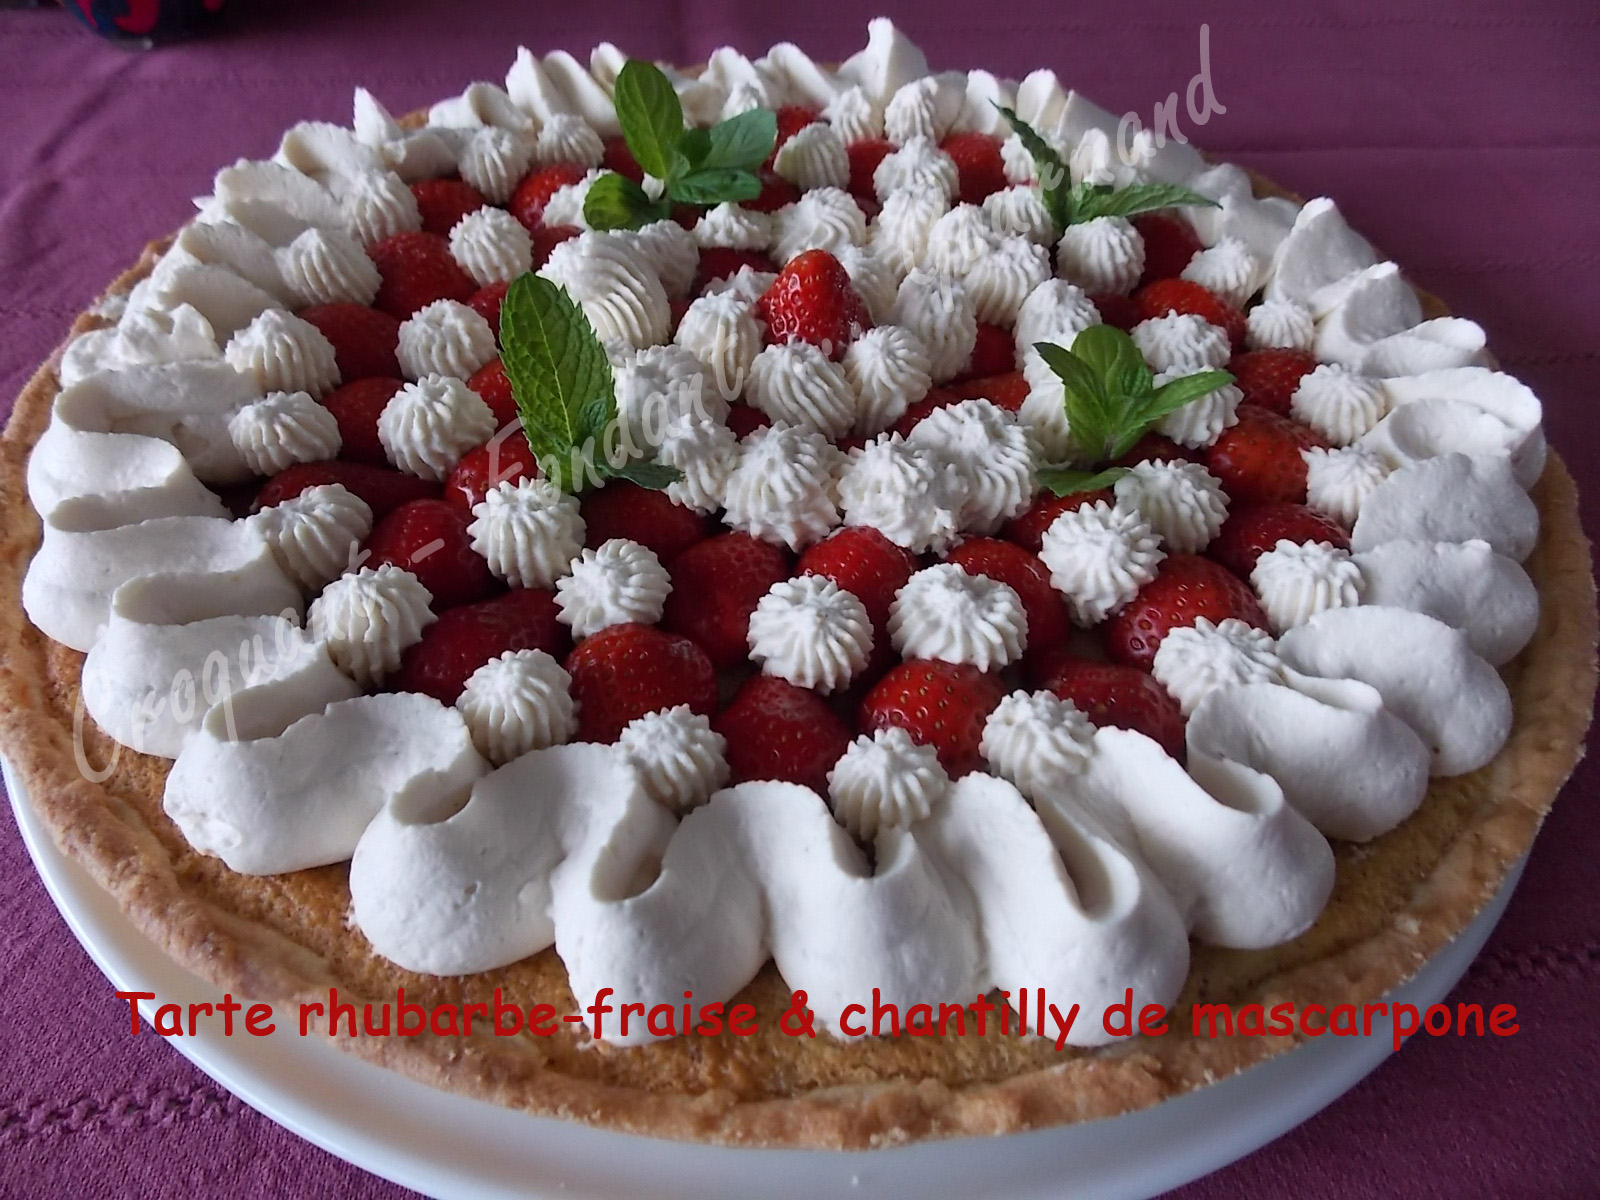 Tarte rhubarbe fraise croquant fondant gourmand - Decoration gateau avec creme chantilly ...